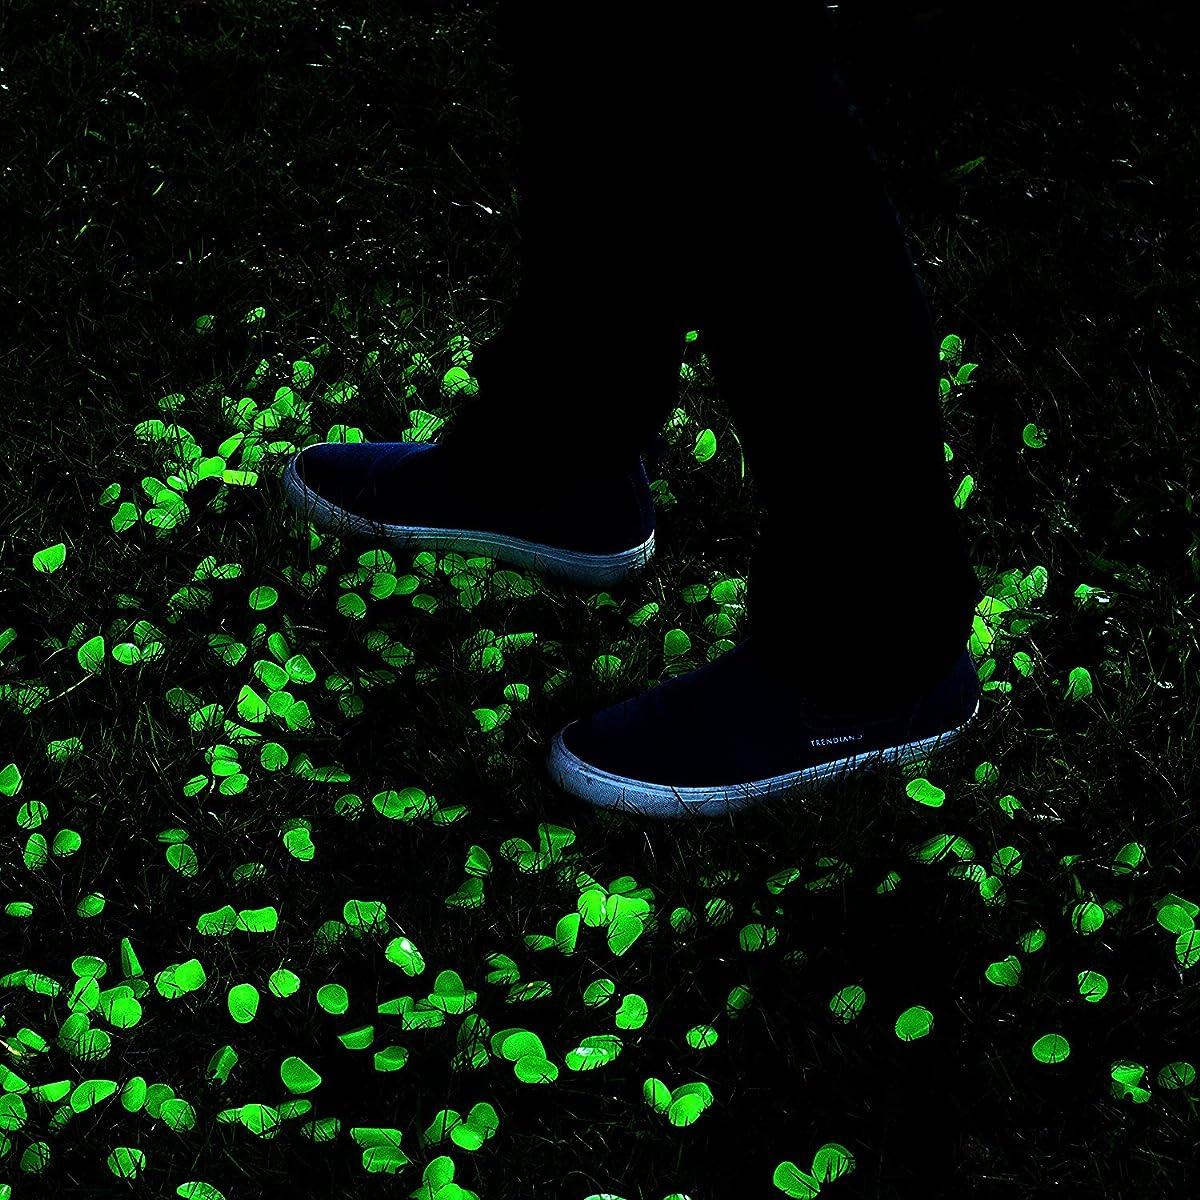 ONSON 200pcs Glow in the Dark Garden Pebbles,Glow Stones Rocks for Walkways Outdoor Decor Aquarium Fish Tank Garden Decorative Stones for Path Lawn Yard Walkway -Green